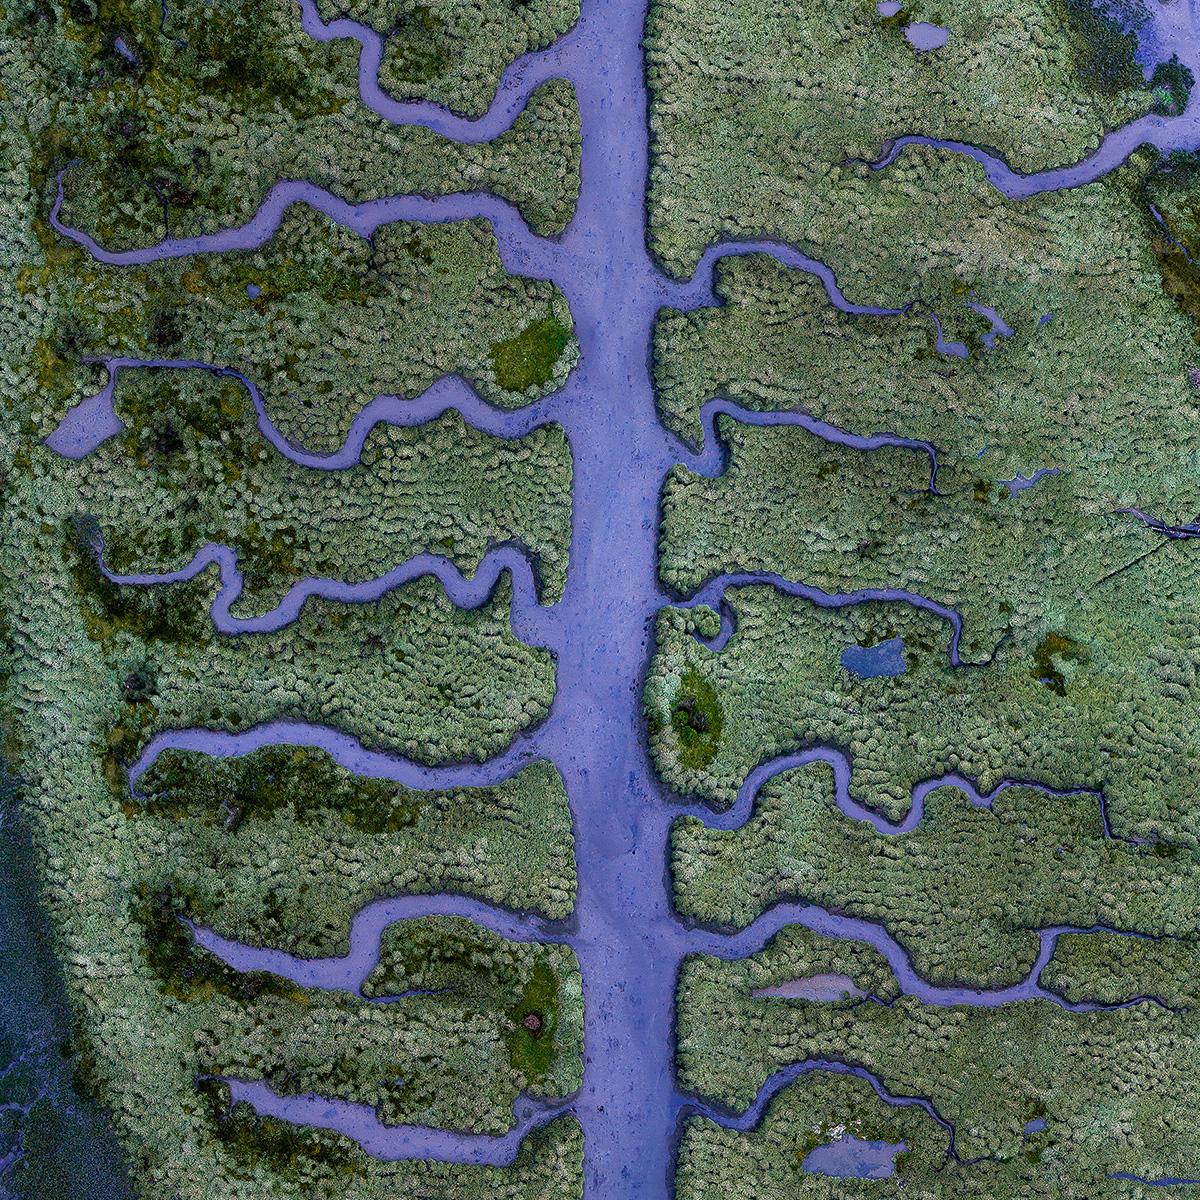 07-water-shape-earth-watershape.earth-milan-radisics-photography-fine-art-print-milan.hu_